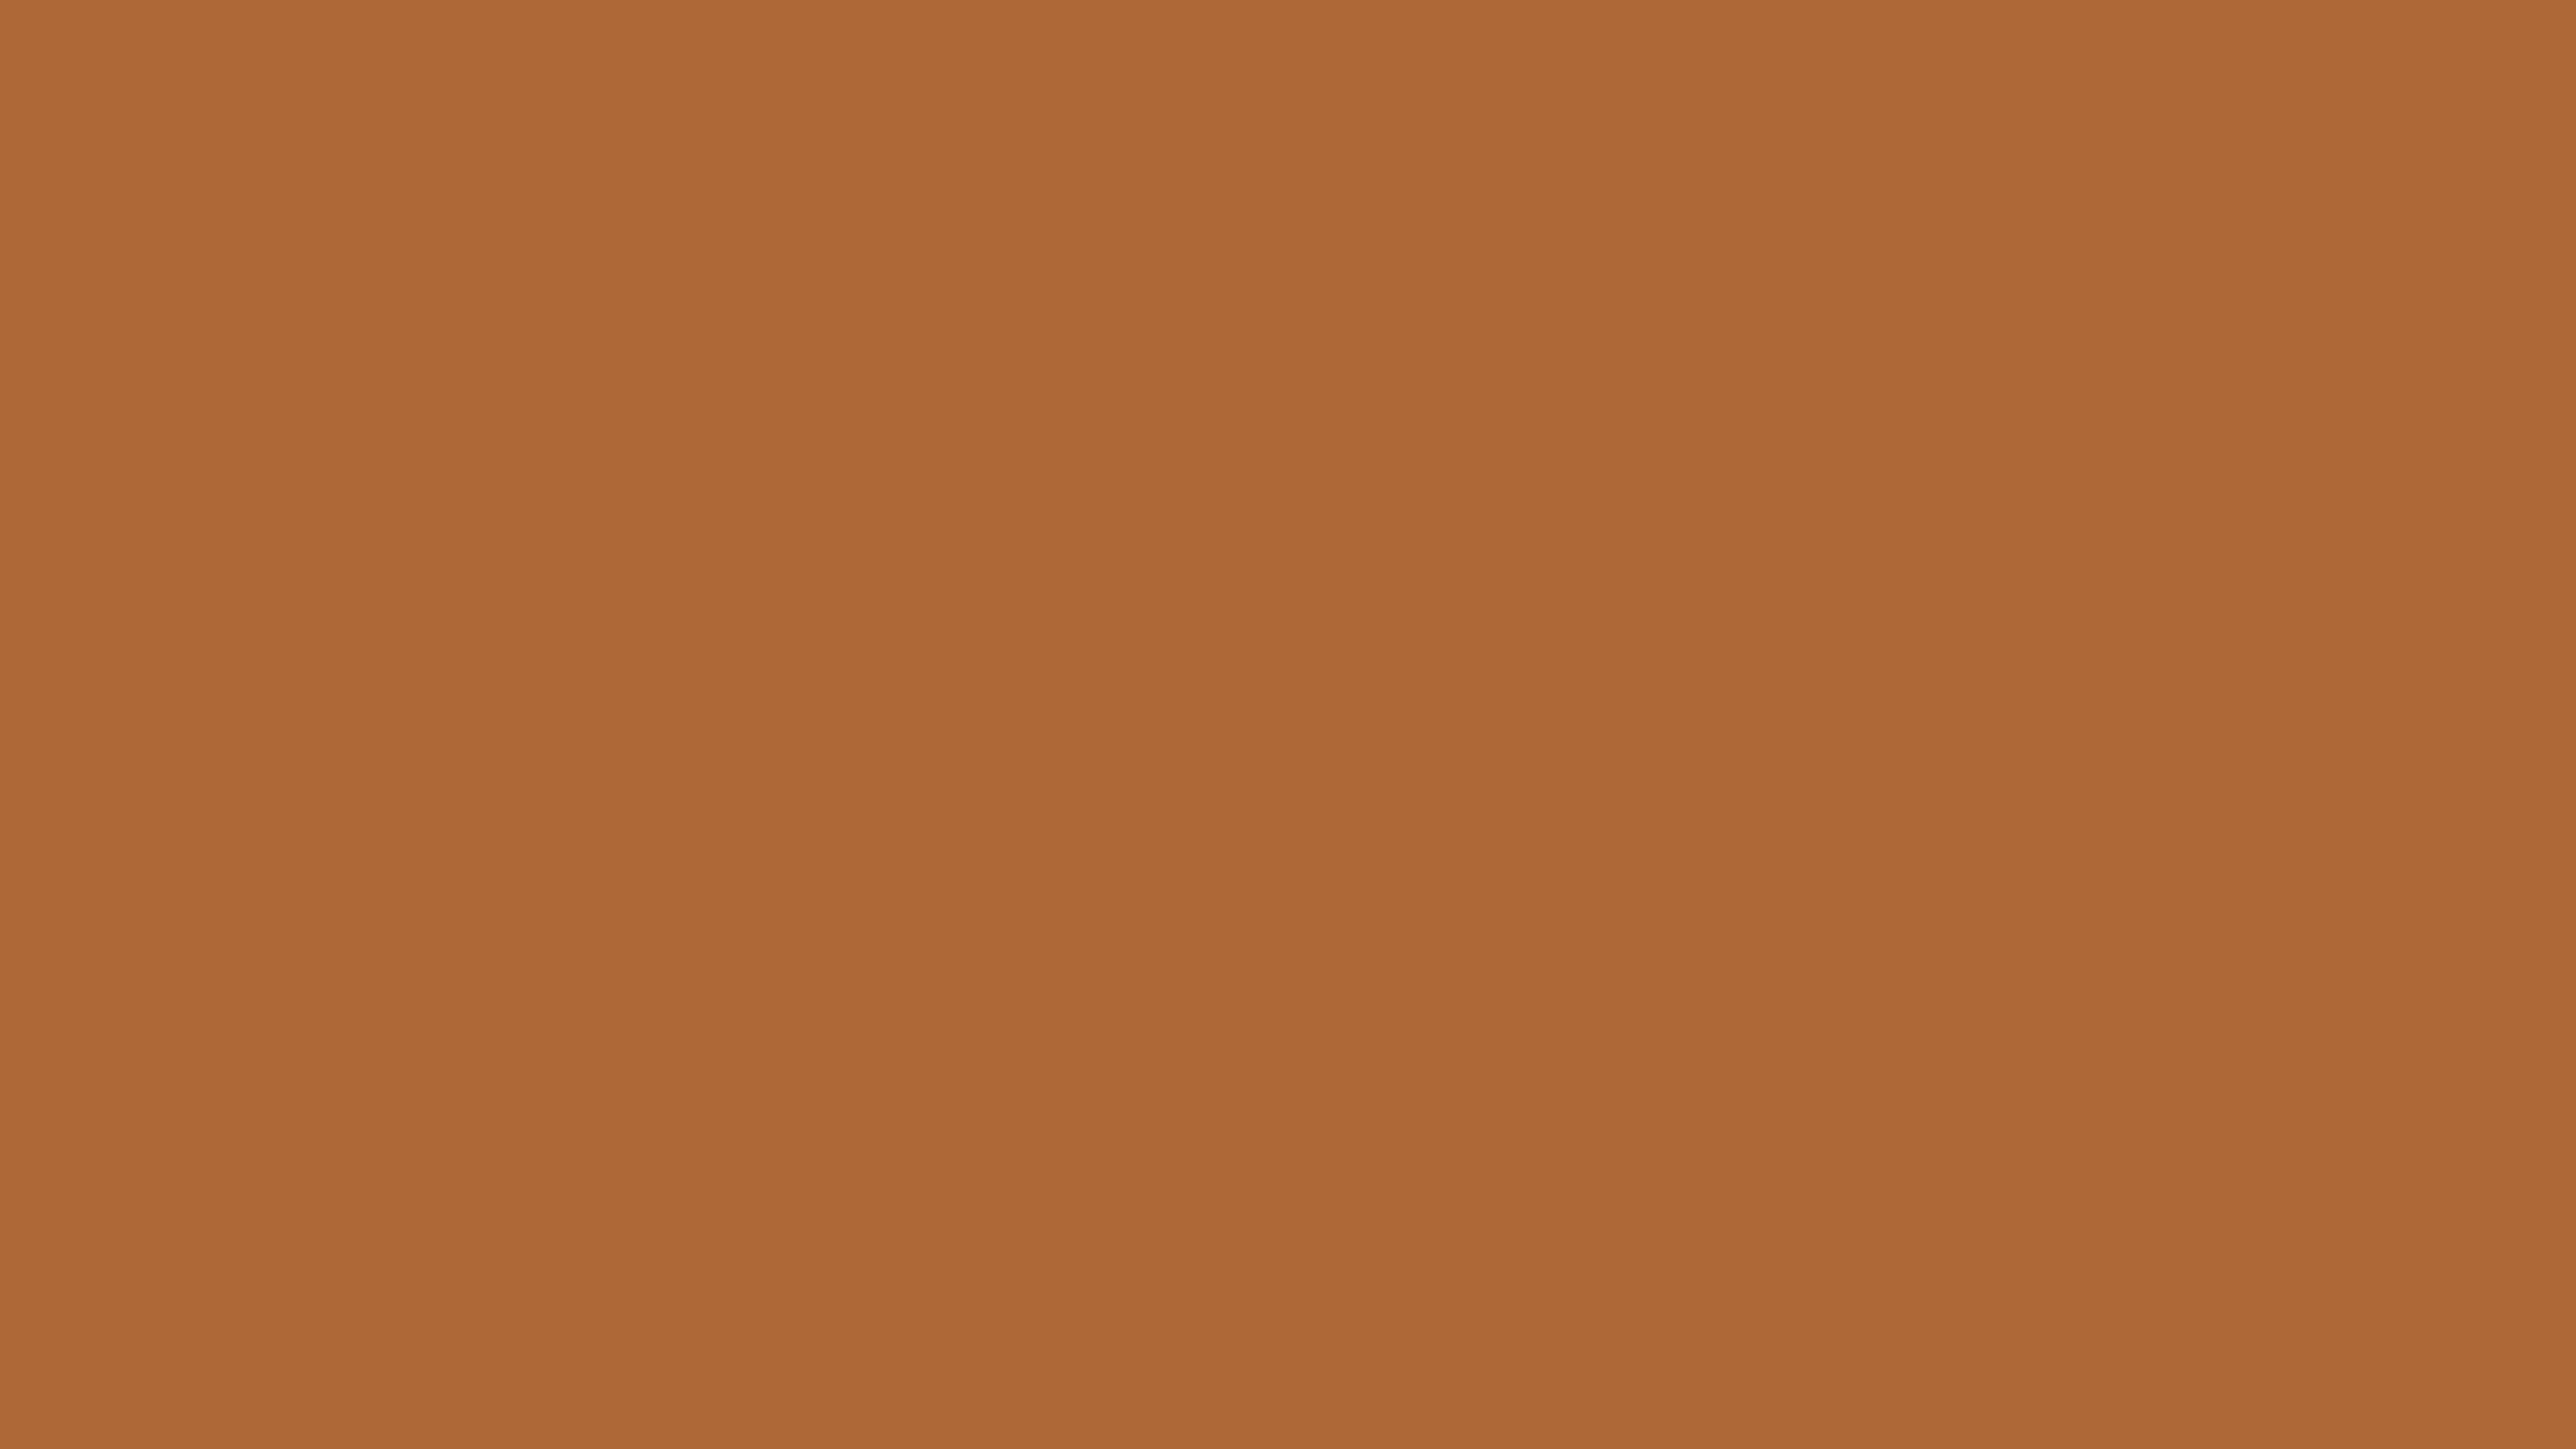 4096x2304 Windsor Tan Solid Color Background